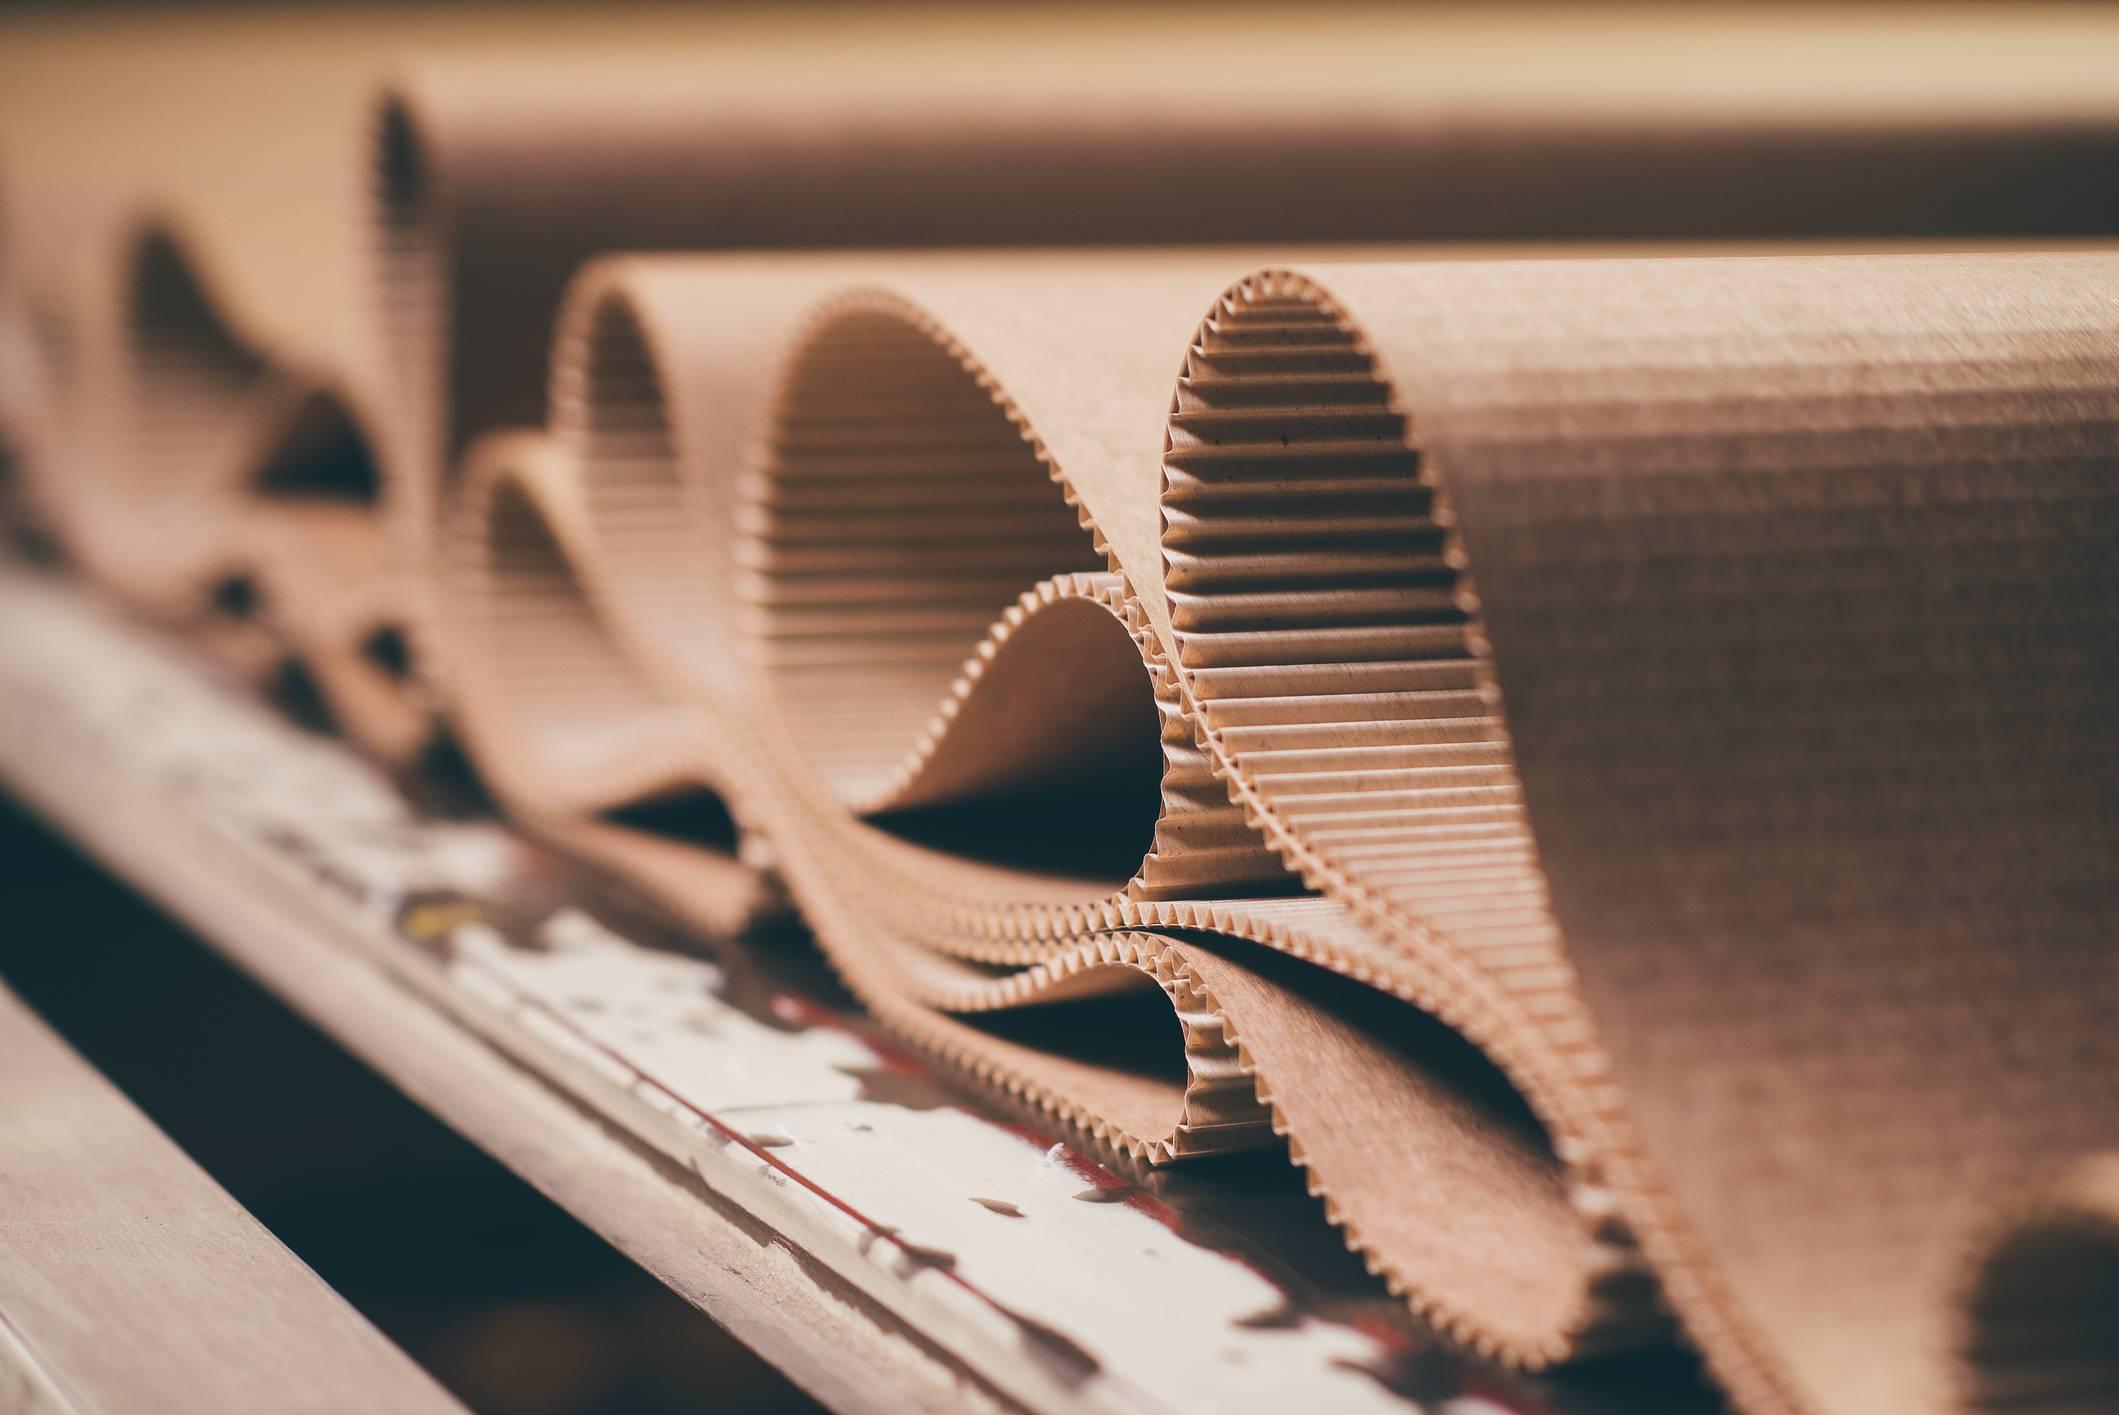 Folded, corrugated cardboard